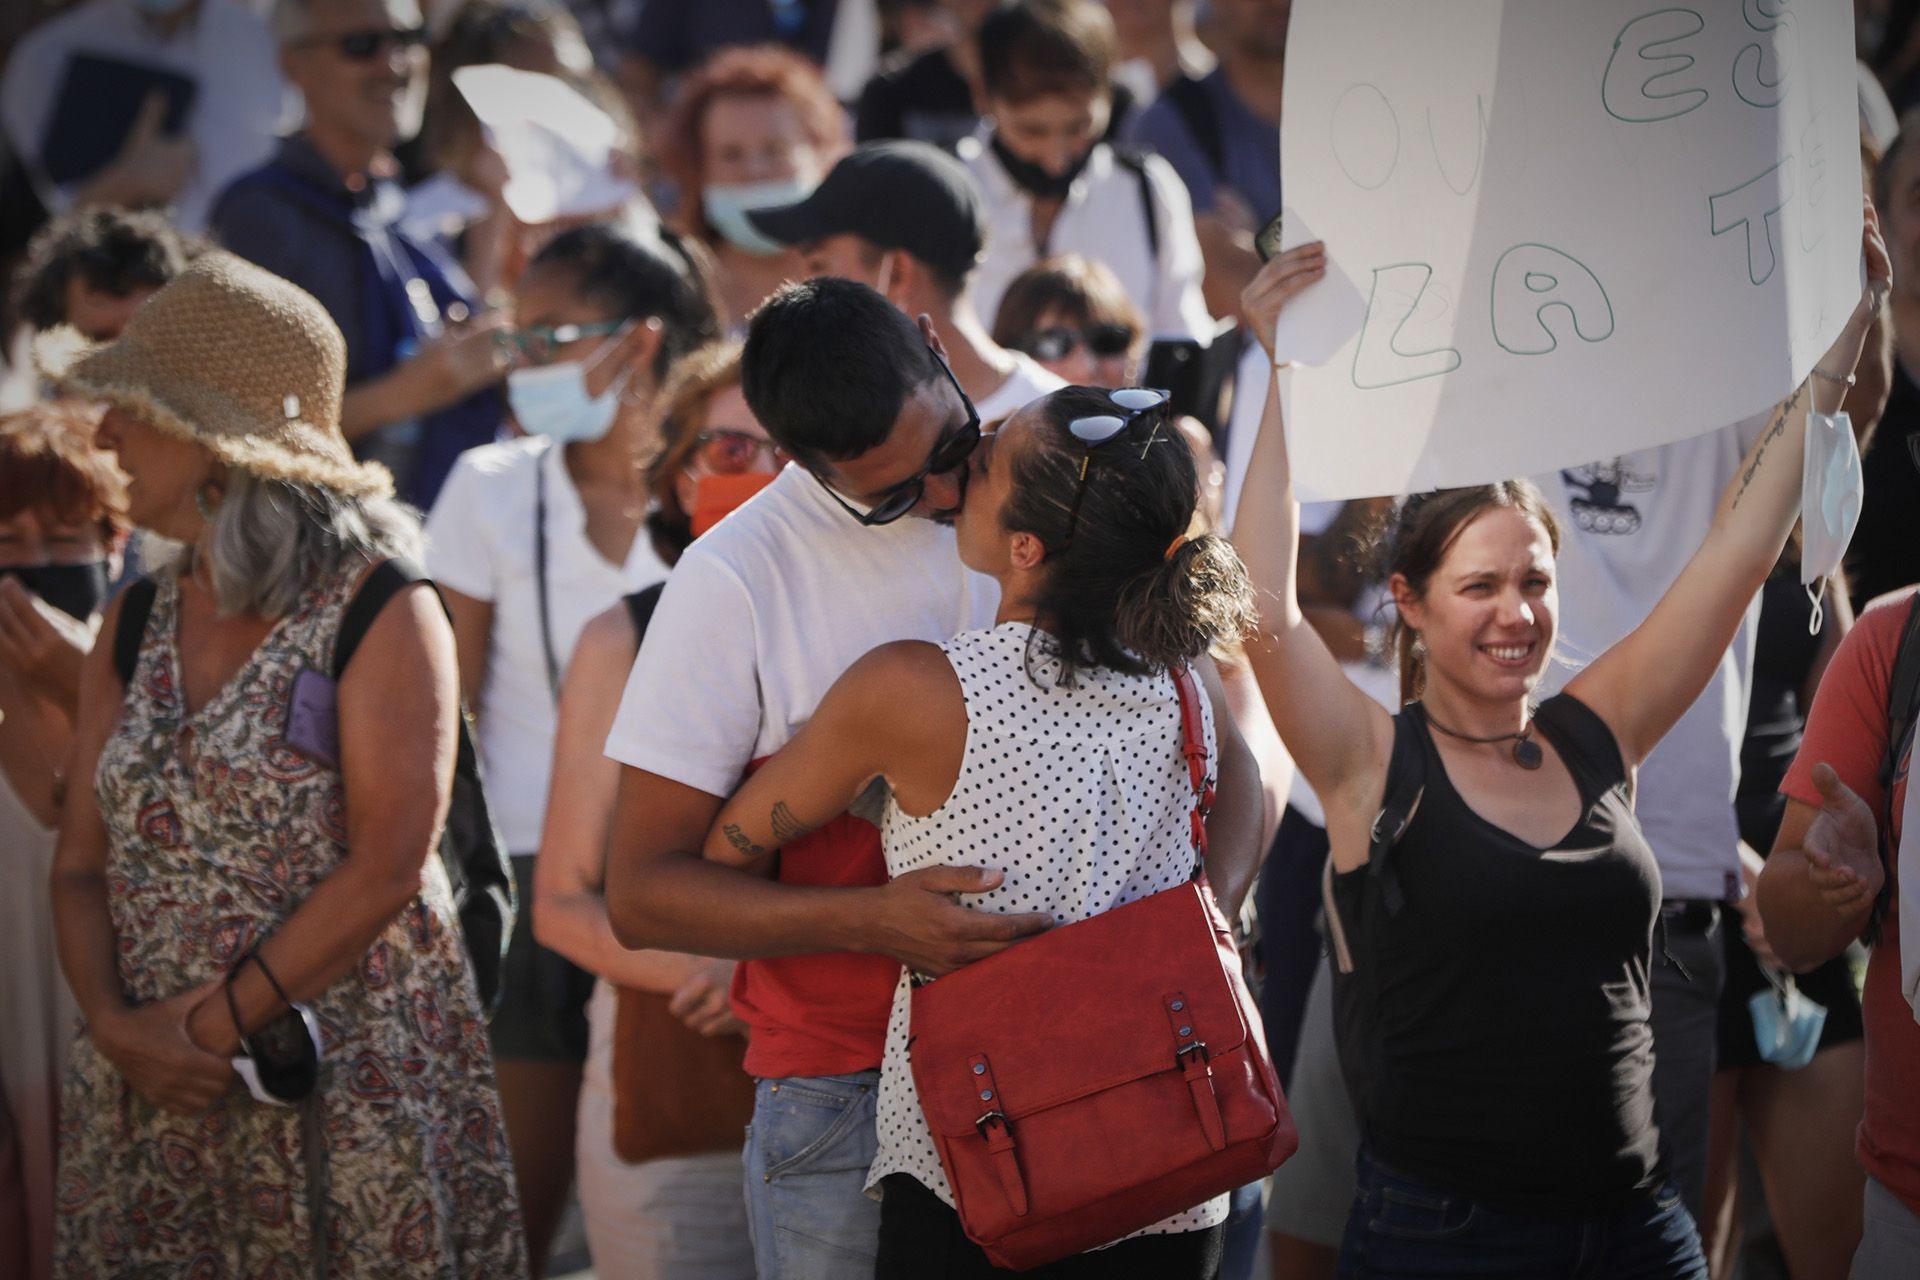 Fotó: Jesus Hellin/ Europa Press via Getty Images